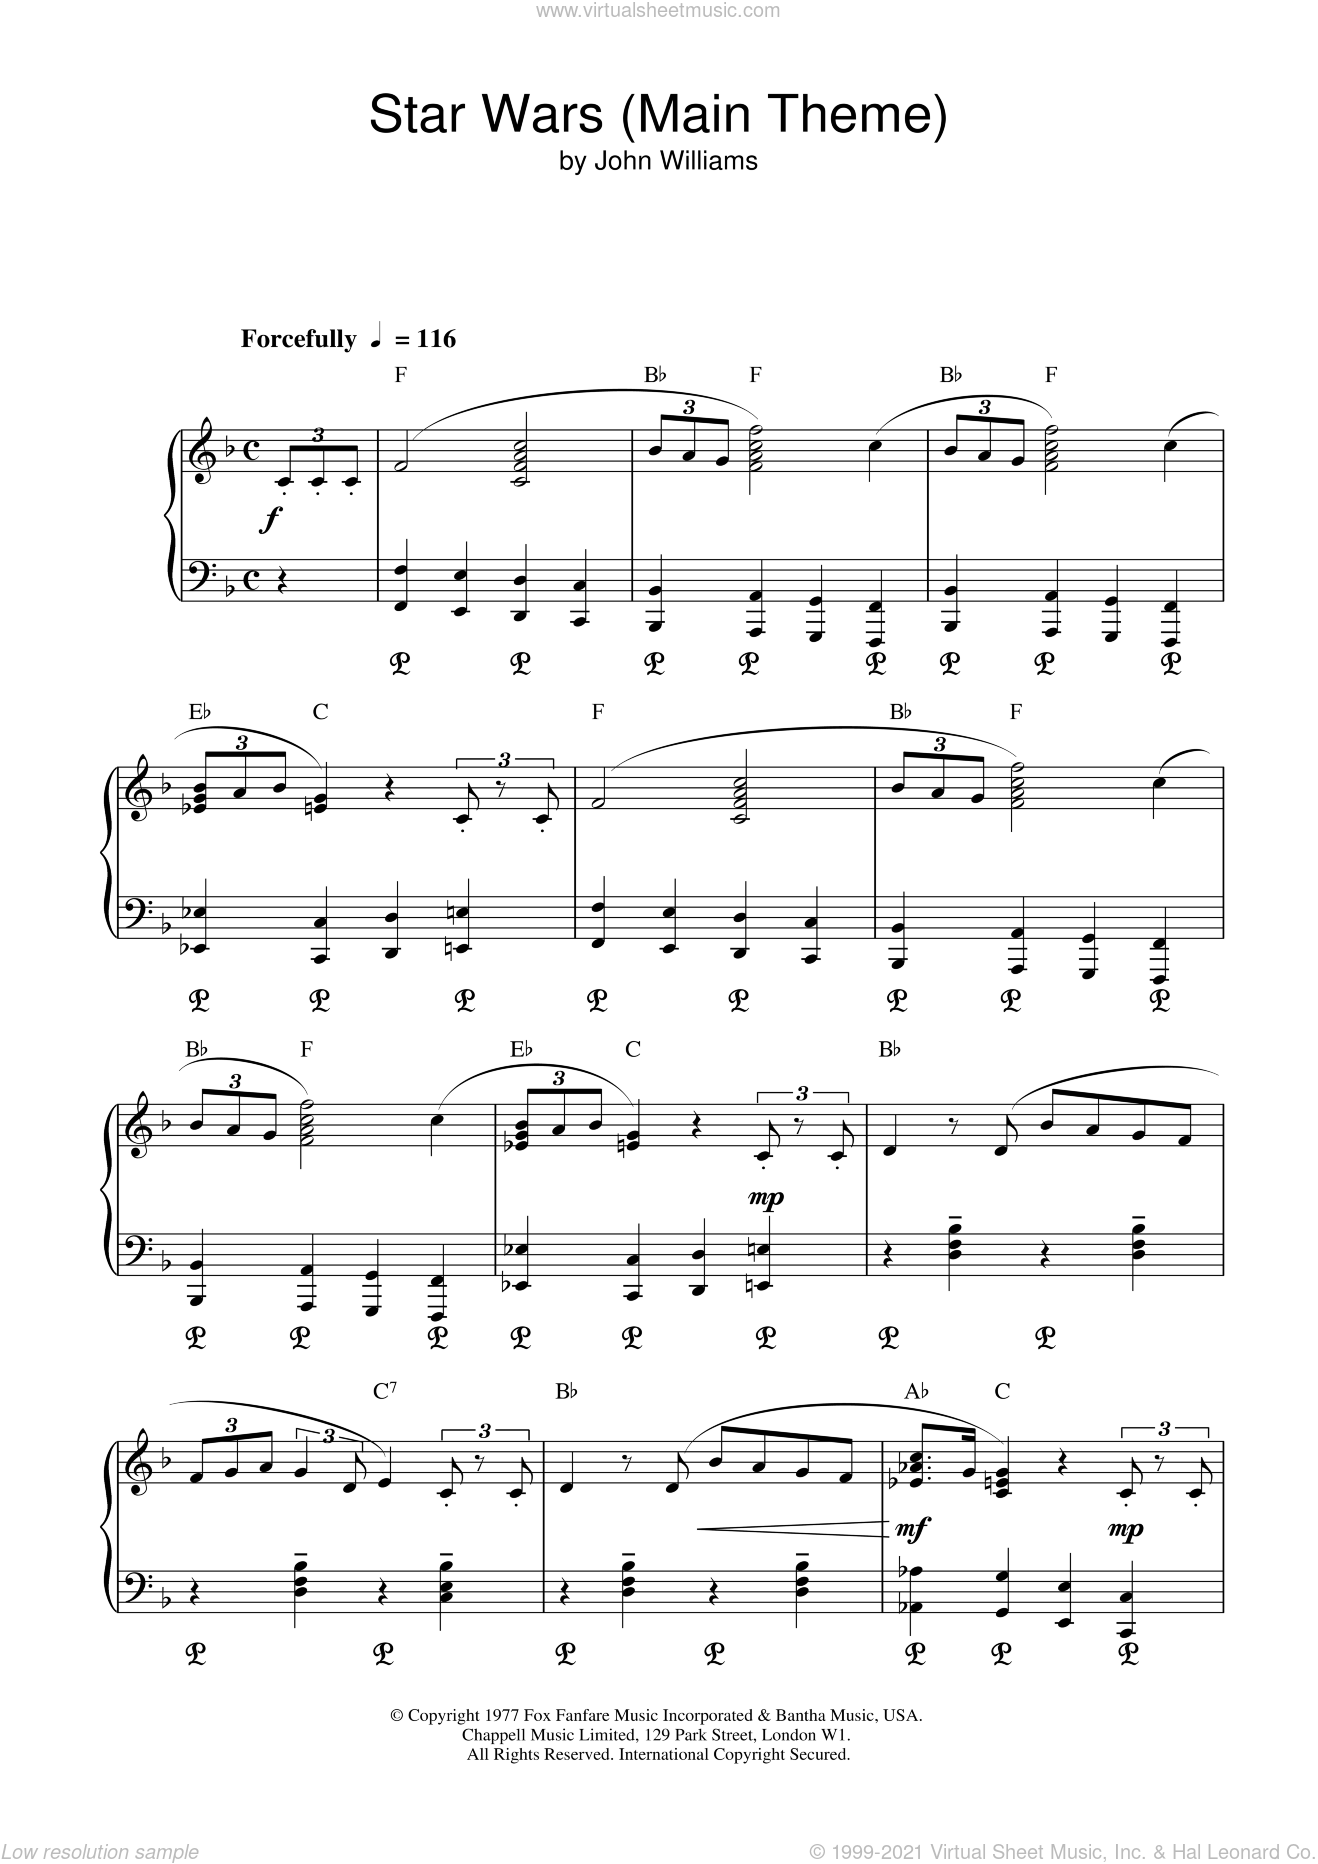 Star Wars (Main Theme), (intermediate) sheet music for piano solo by John Williams, intermediate skill level